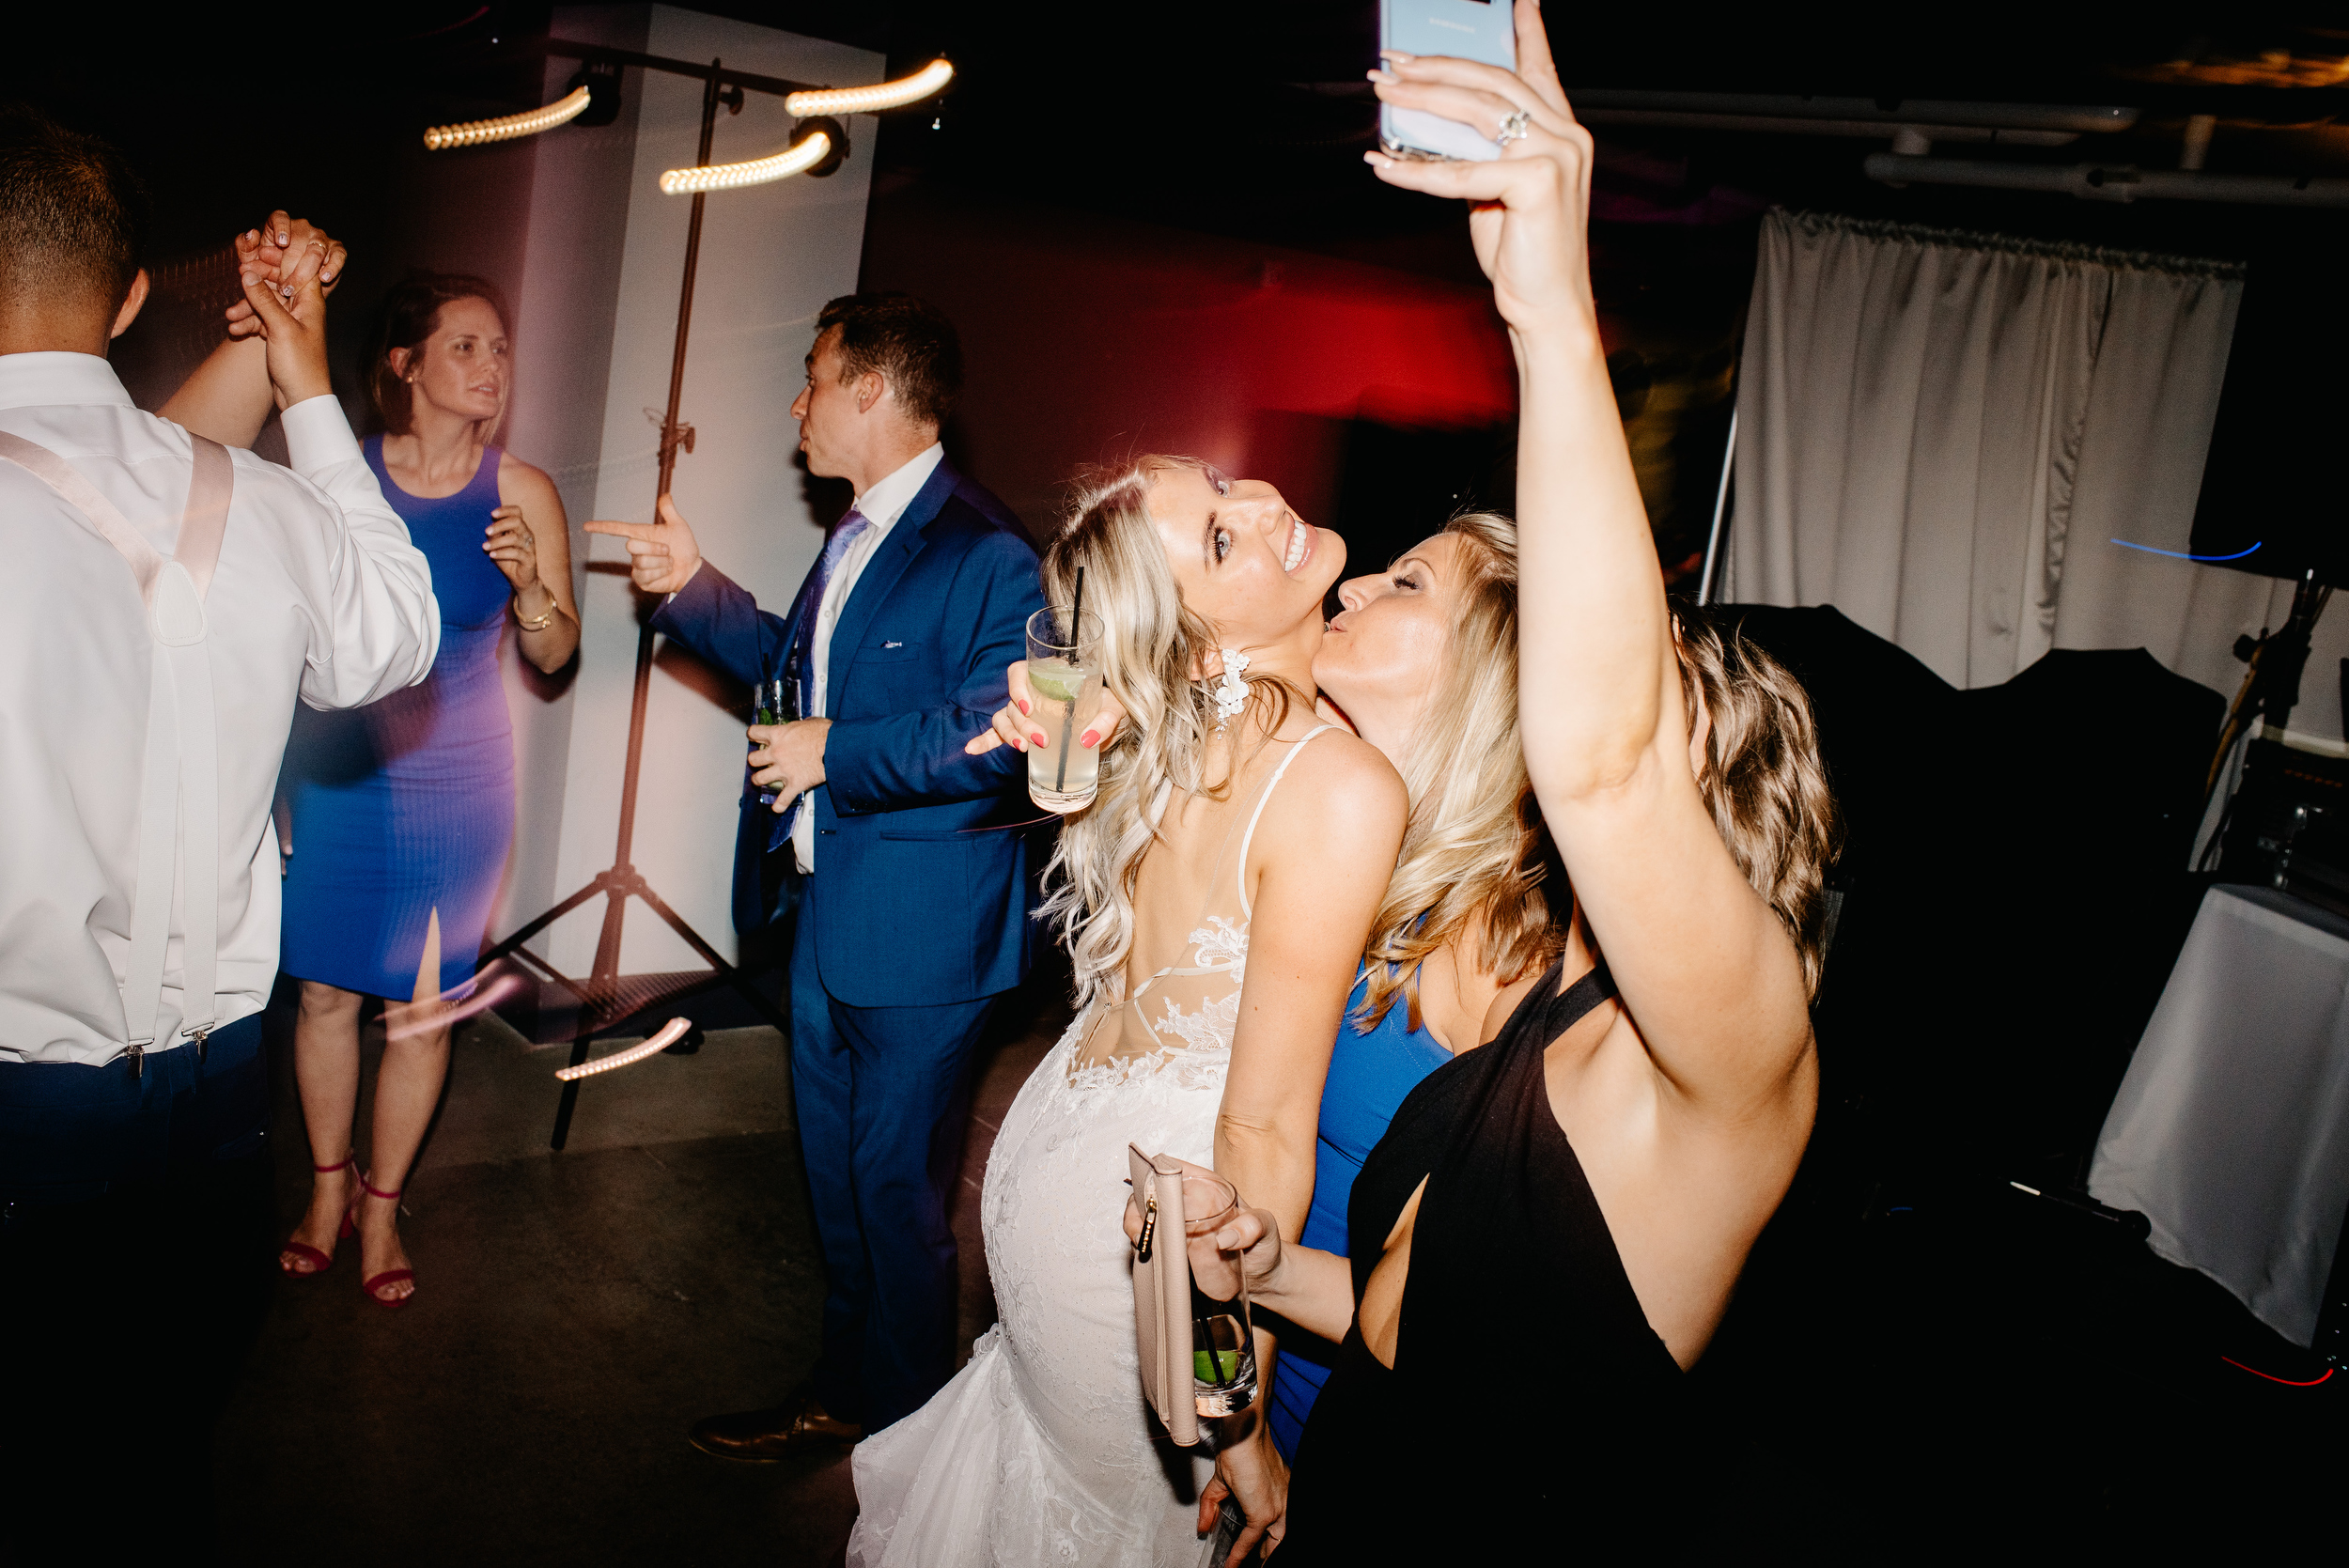 the_hotel_salem_wedding_mikhail_glabets_60.JPG